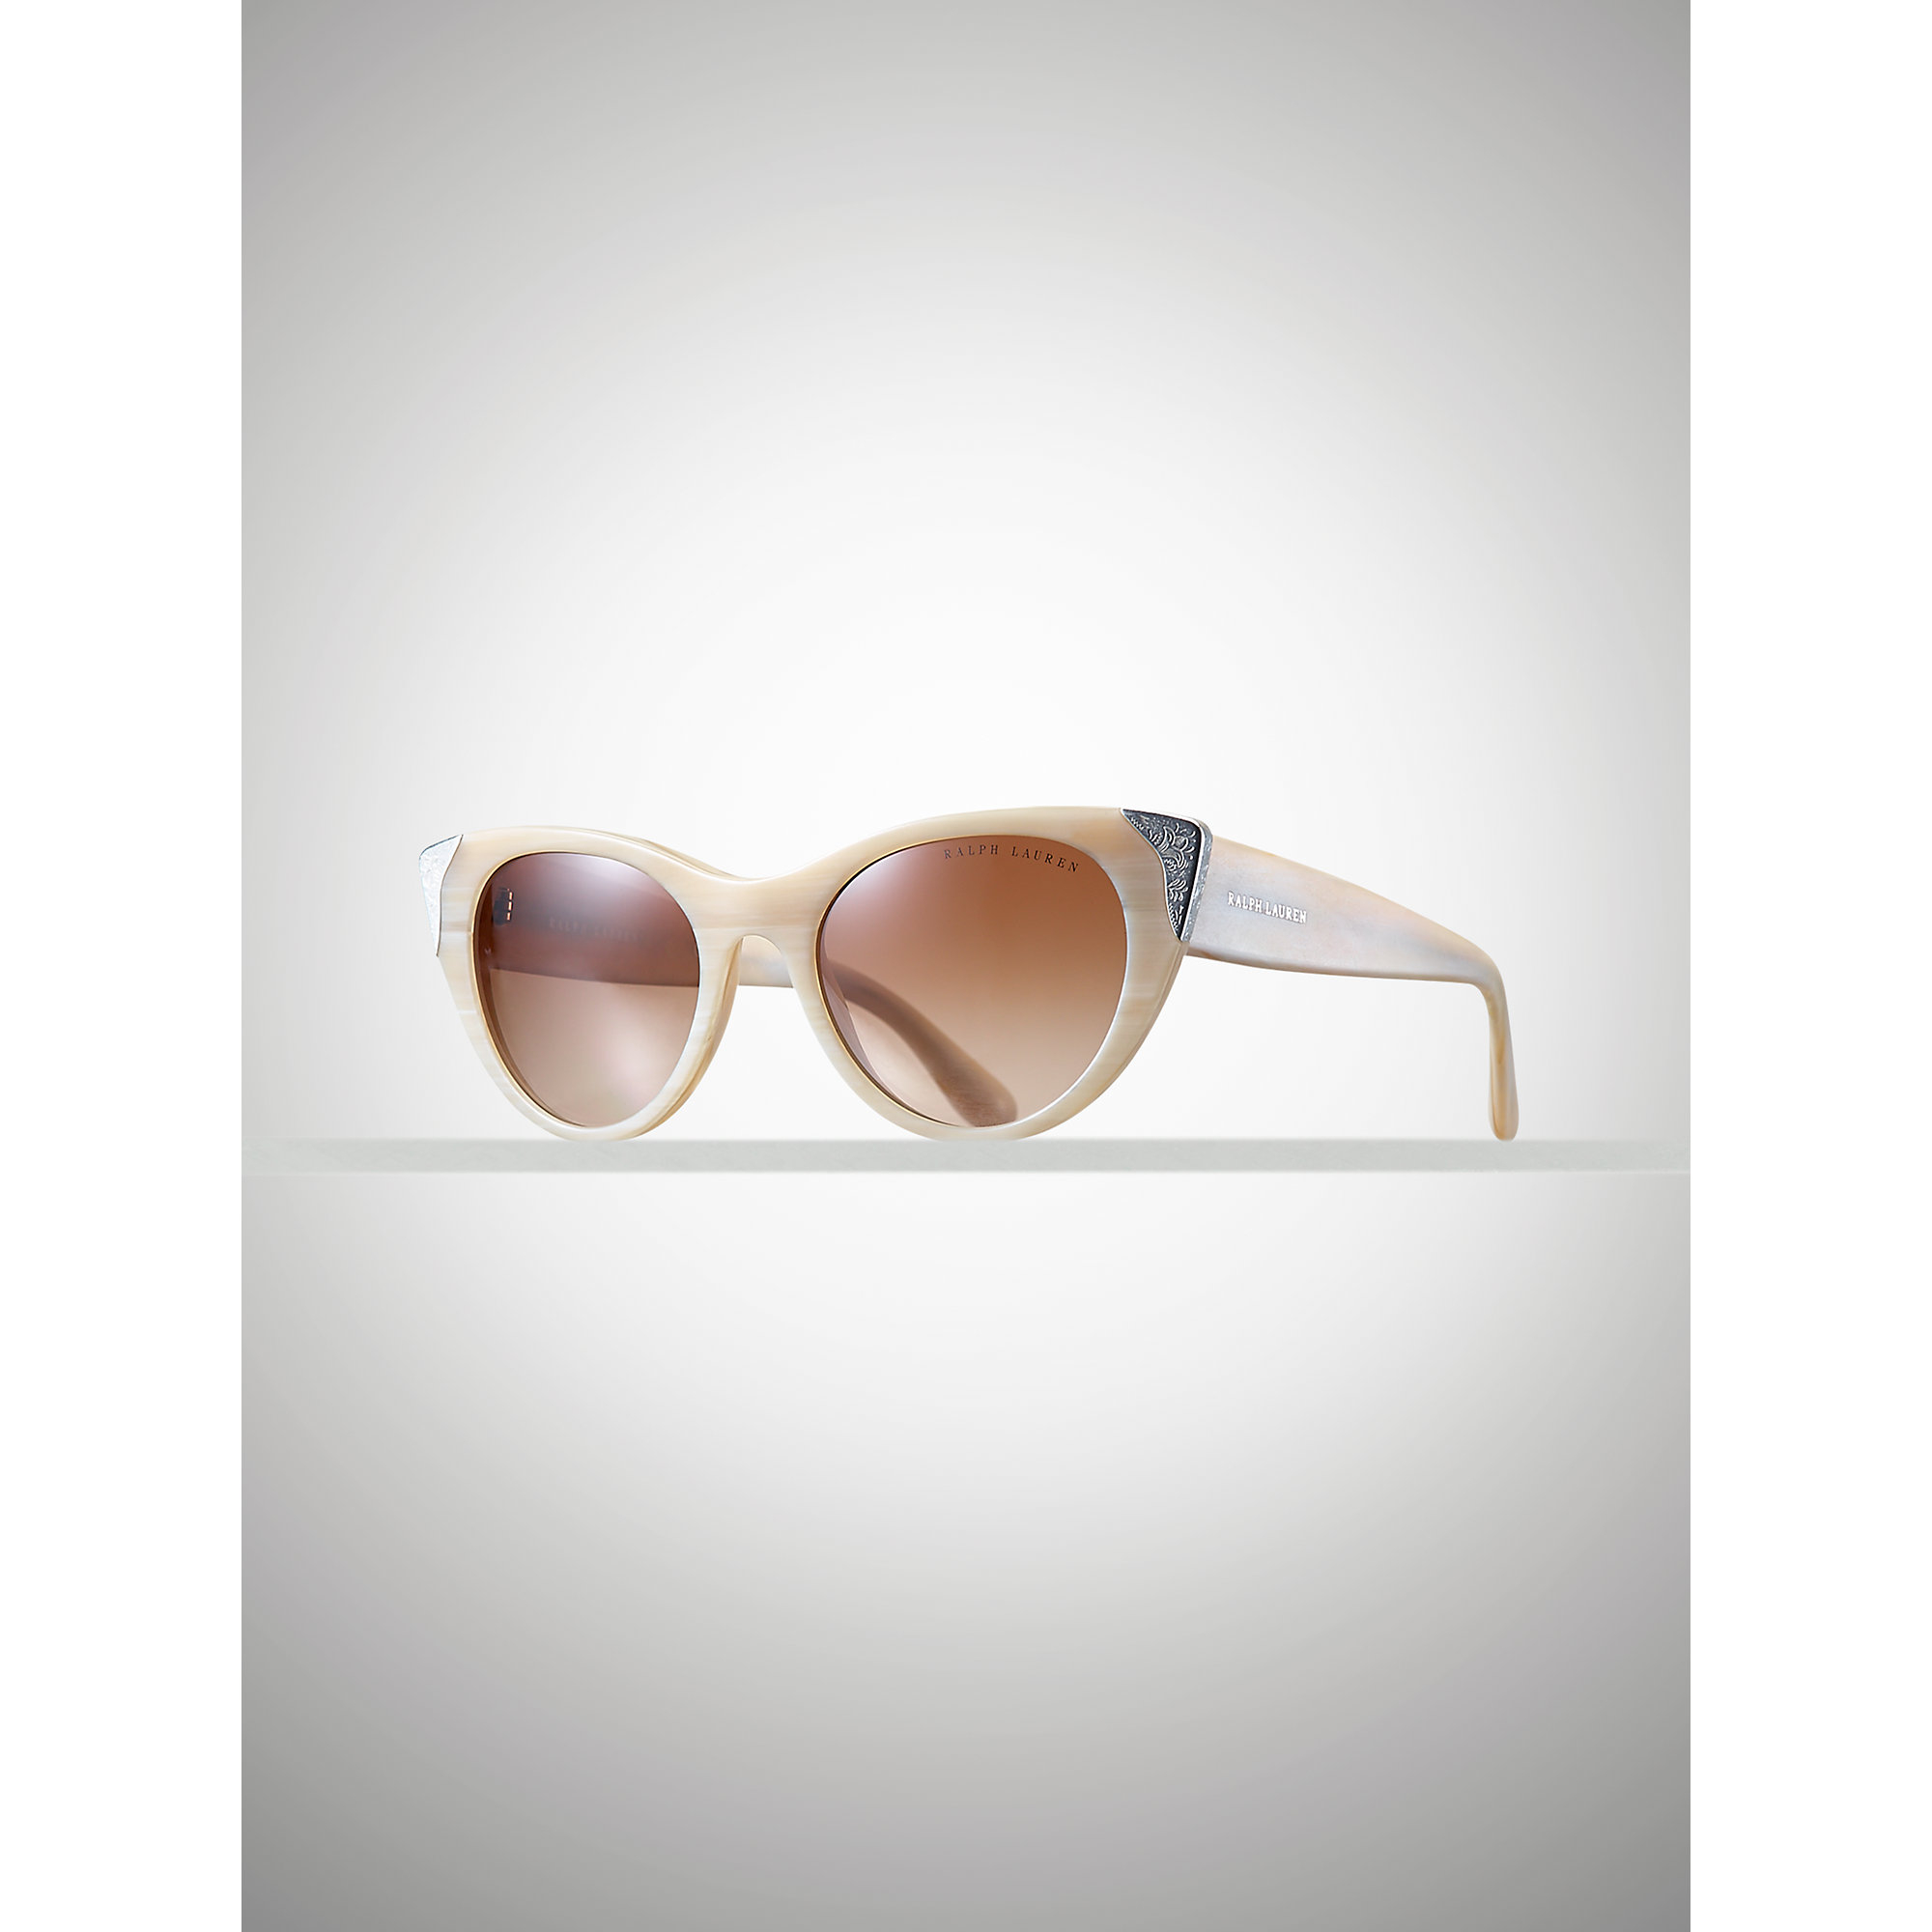 0a69a5b945 Lyst - Ralph Lauren Western Cat Eye Sunglasses in Natural